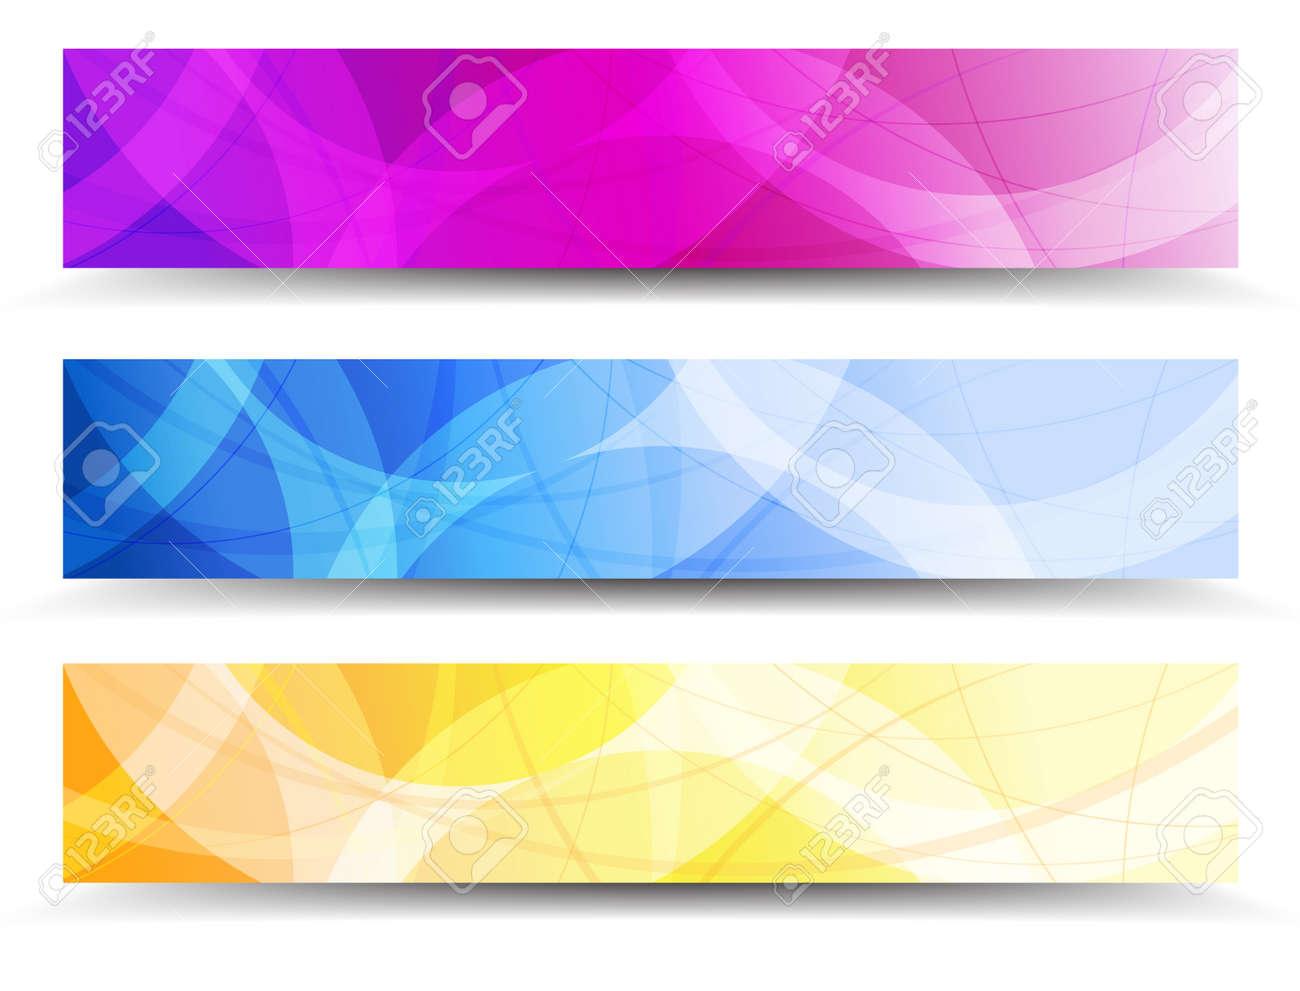 Background image header - Jpg 1300x991 Abstract Header Background